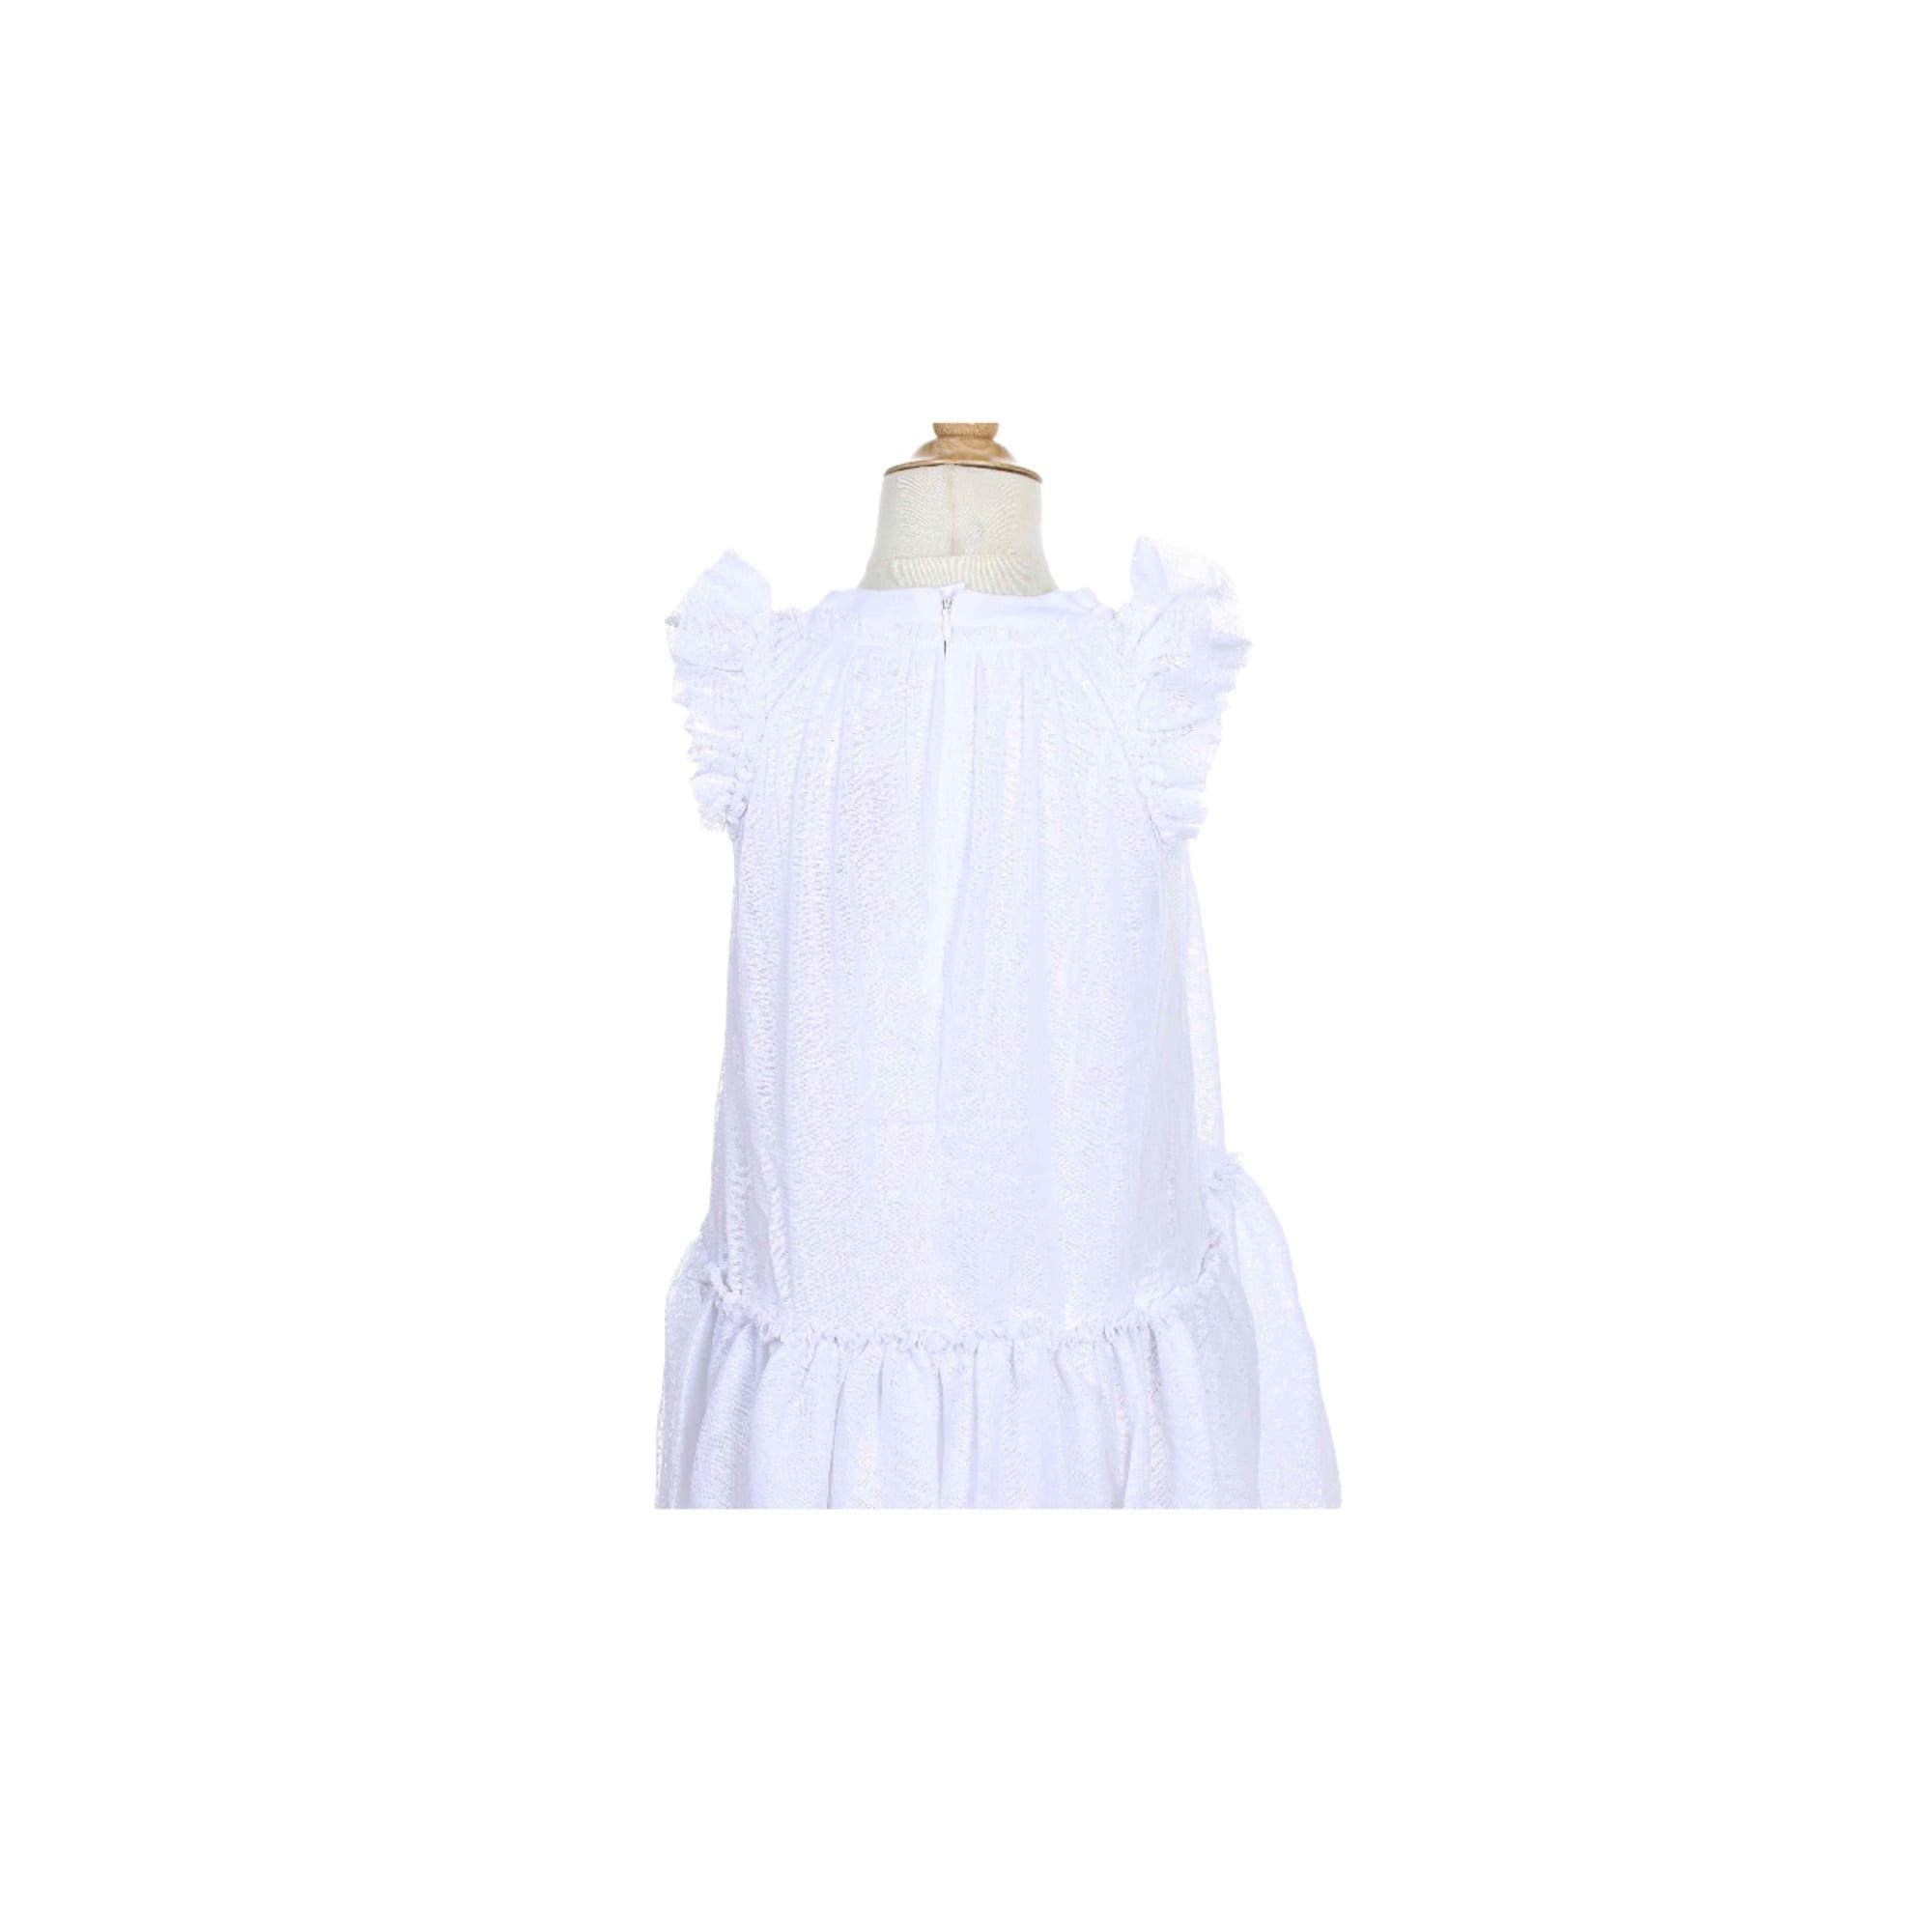 Robe IKKS Blanc, blanc cassé, écru